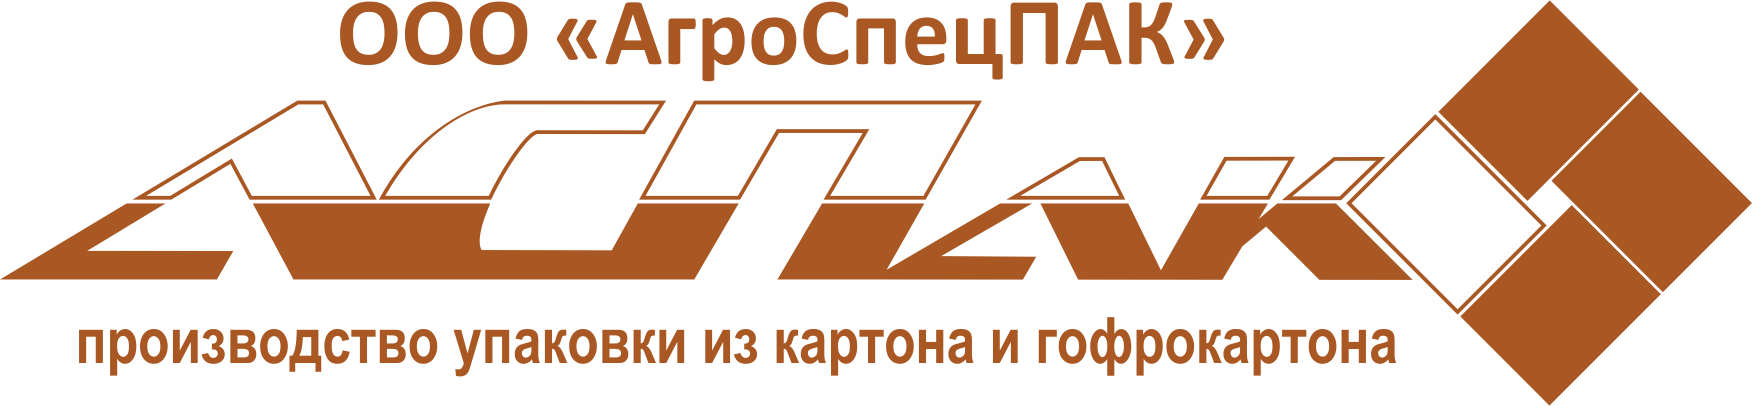 АгроСпецПак